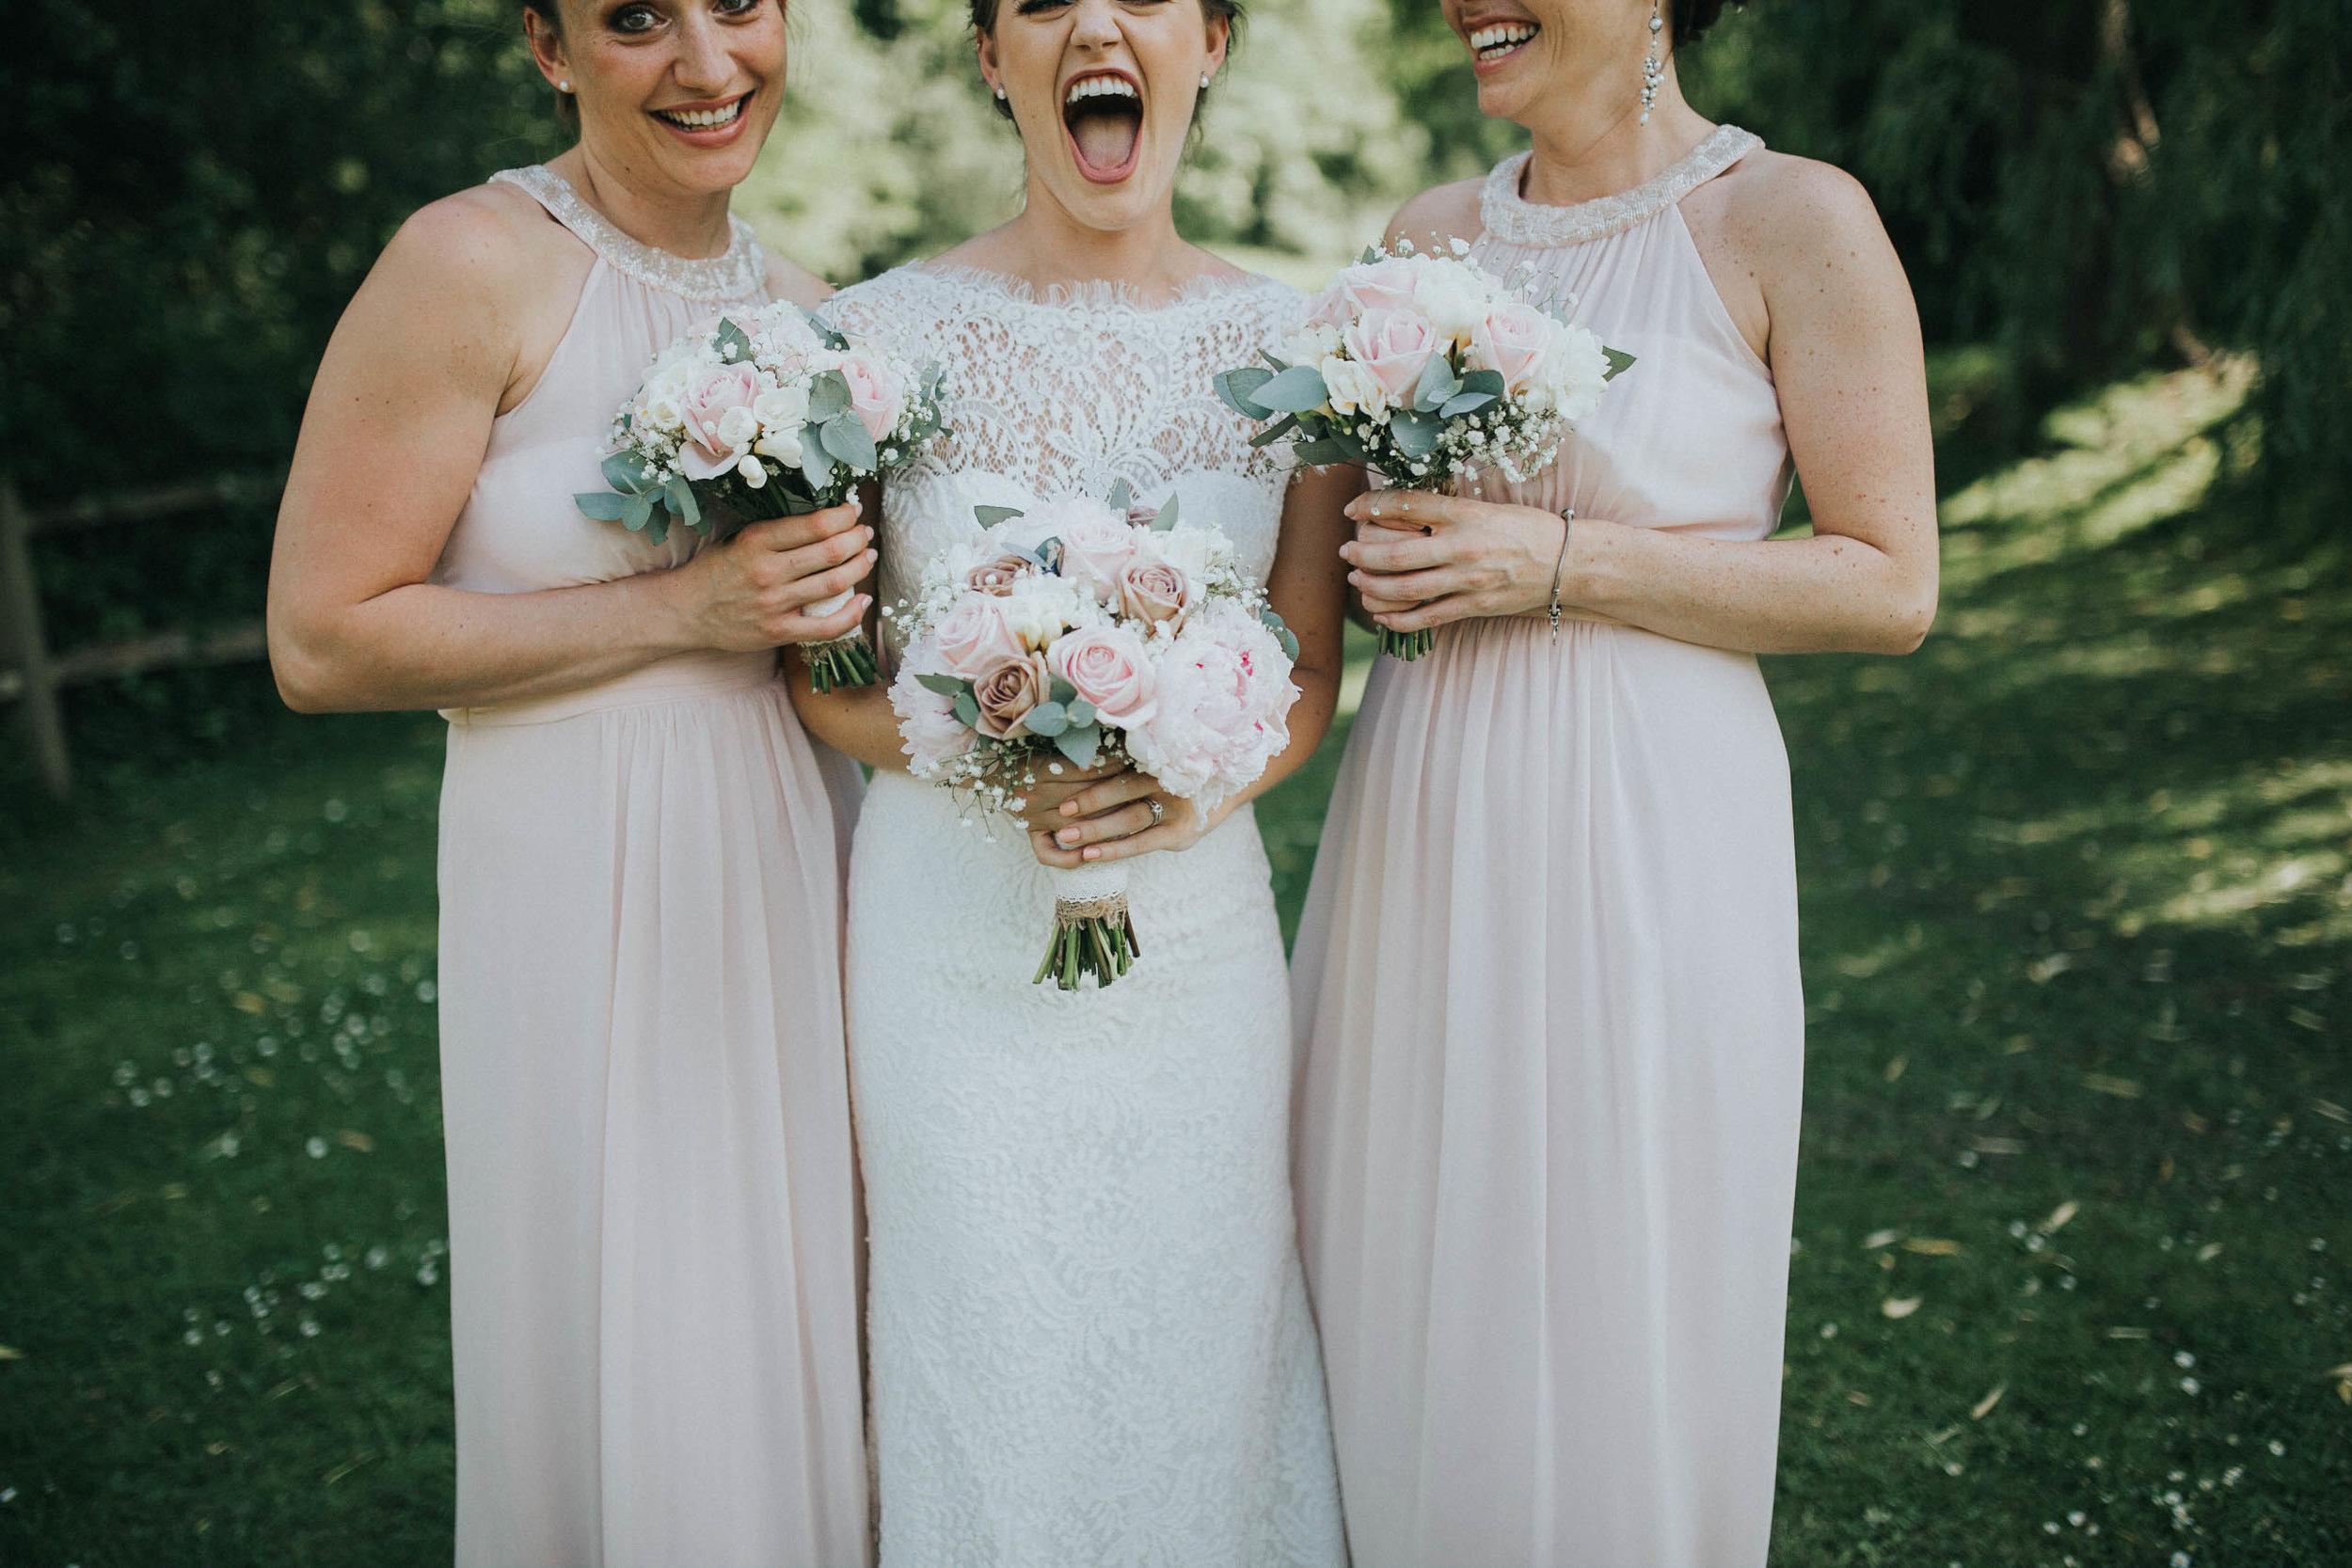 WeddingPhotographerEastSussex-8.jpg